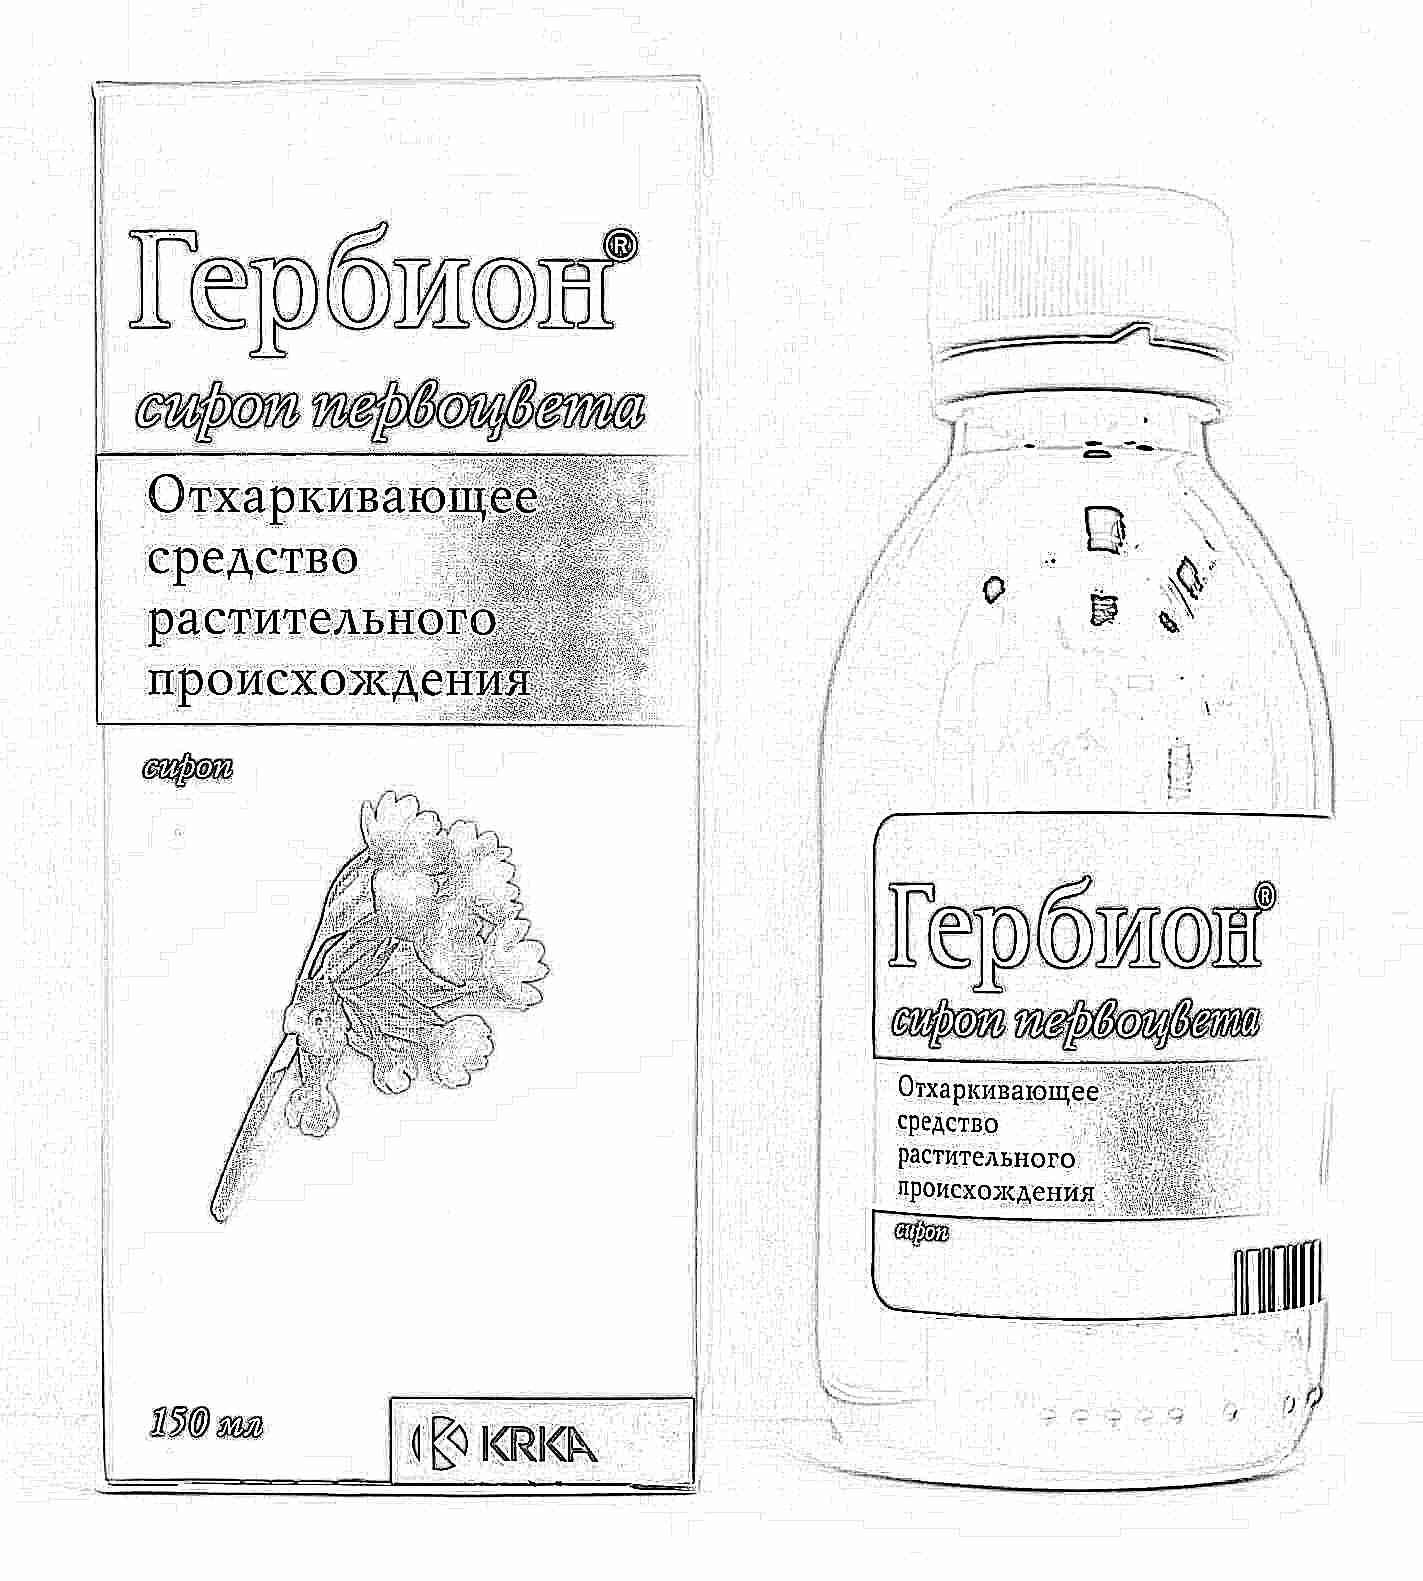 инструкция по применению препарата амбробене сироп